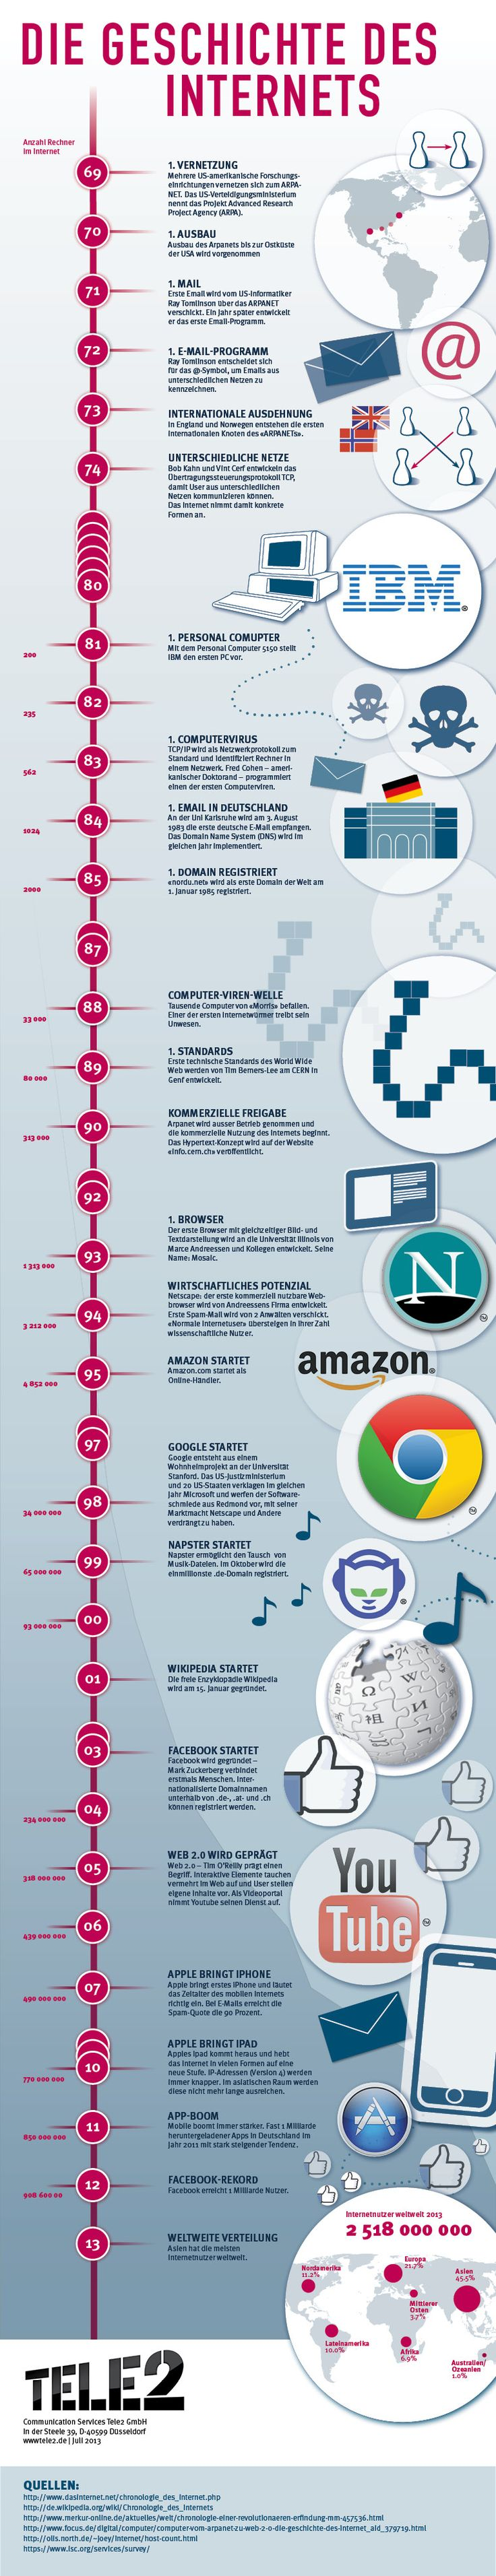 Geschichte des Internets.ashx (769×3997)